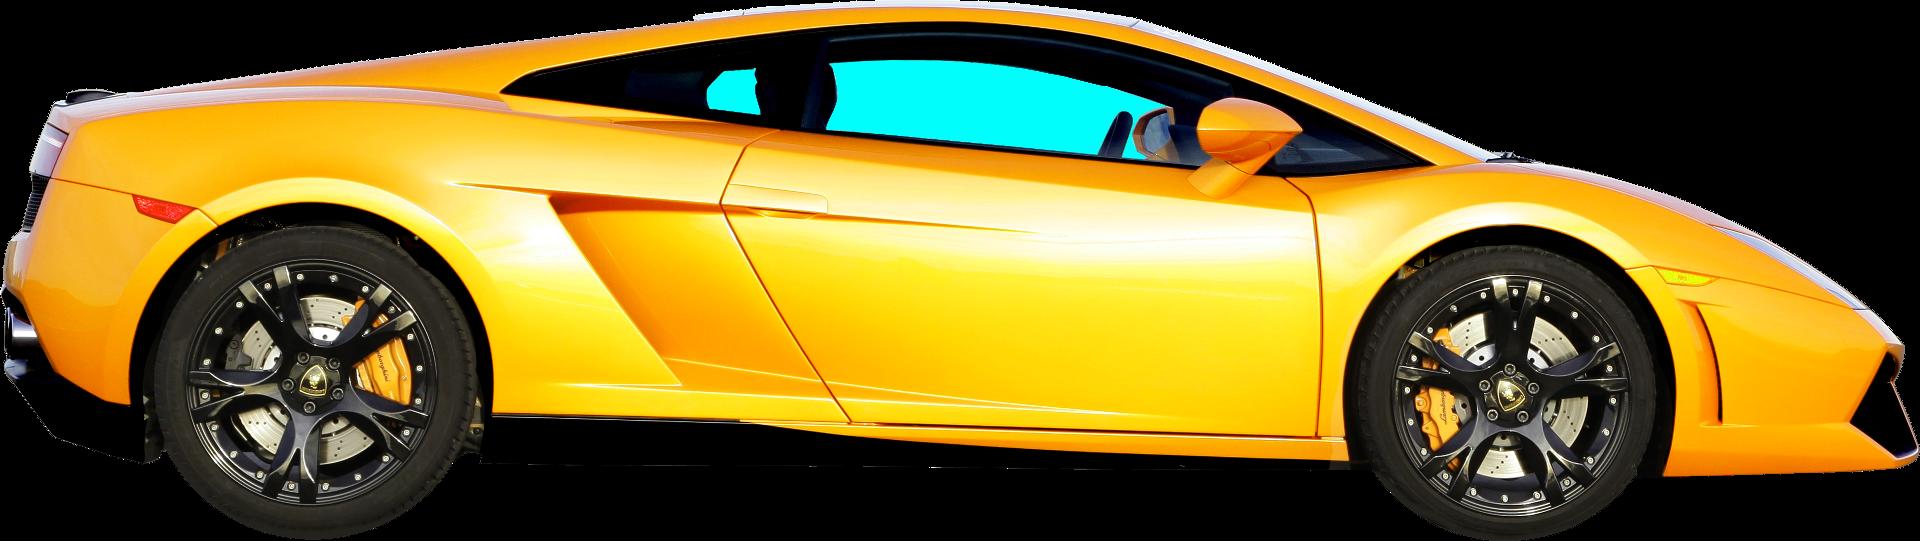 Drive Supercars In Las Vegas Vegassupercars Com Lamborghini